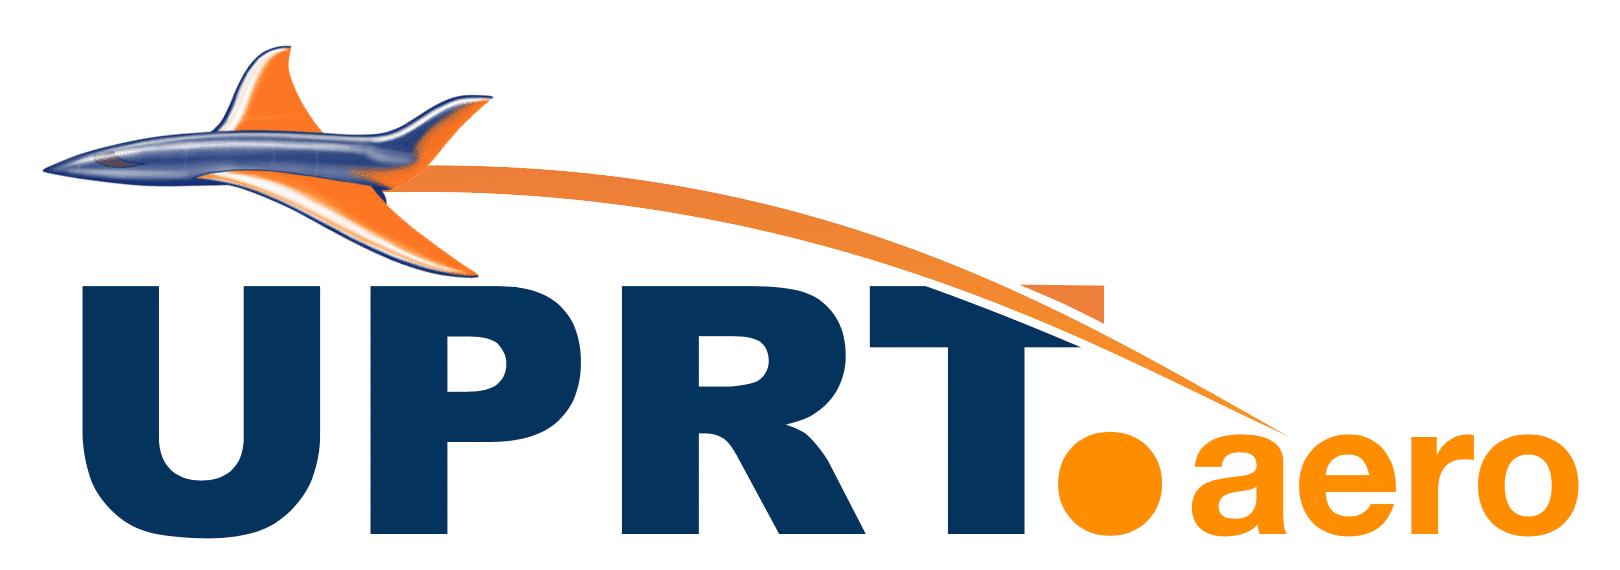 UPRT.aero